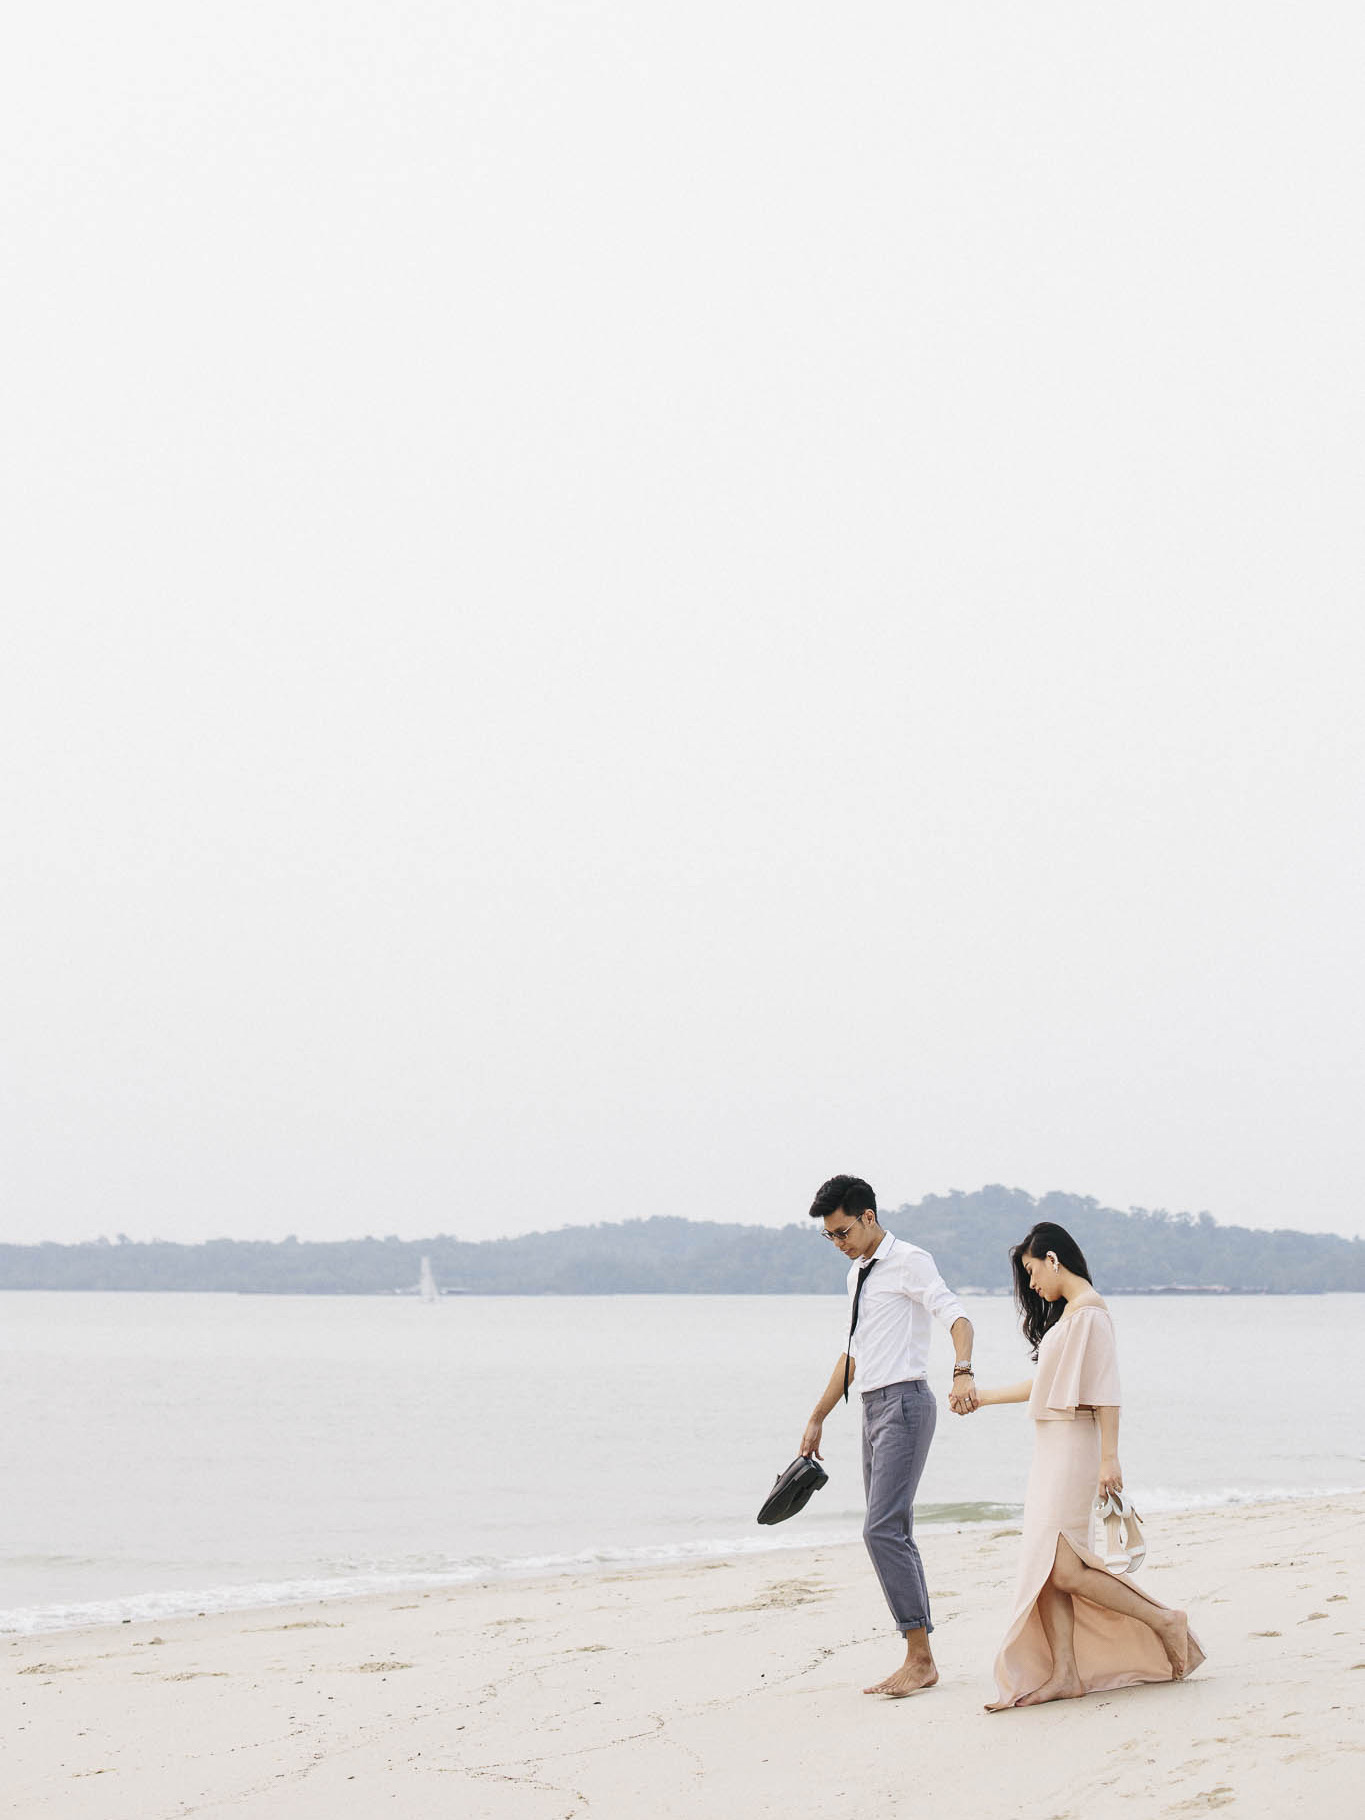 singapore-wedding-photographer-malay-travel-adli-tashah-27.jpg